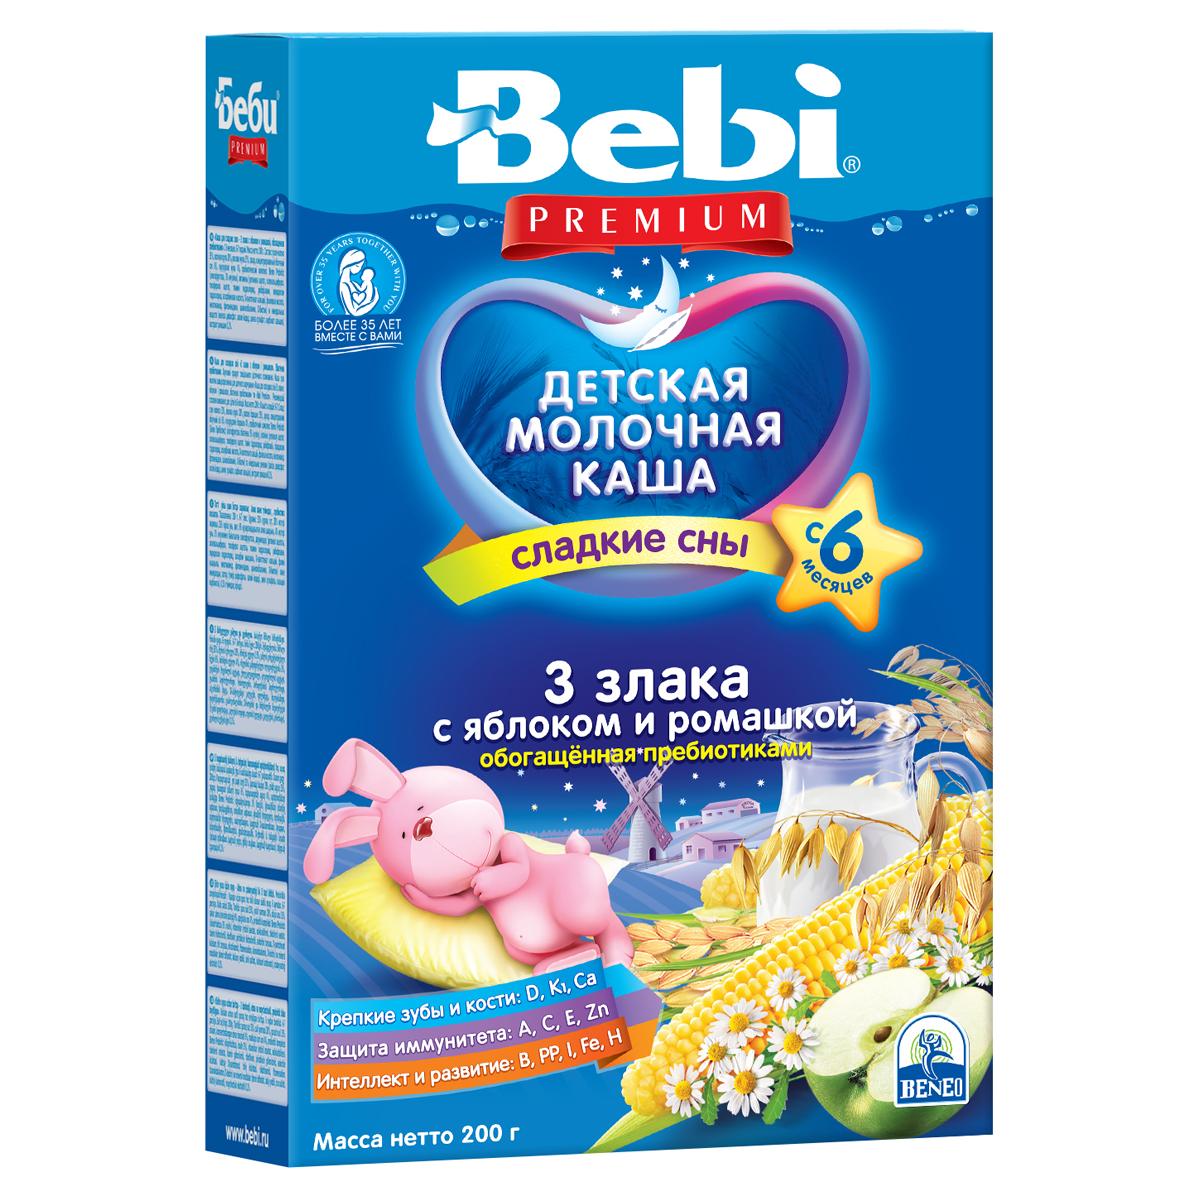 Каша Bebi Premium молочная 200 гр 3 злака яблоко ромашка с пребиотиками (с 6 мес)<br>